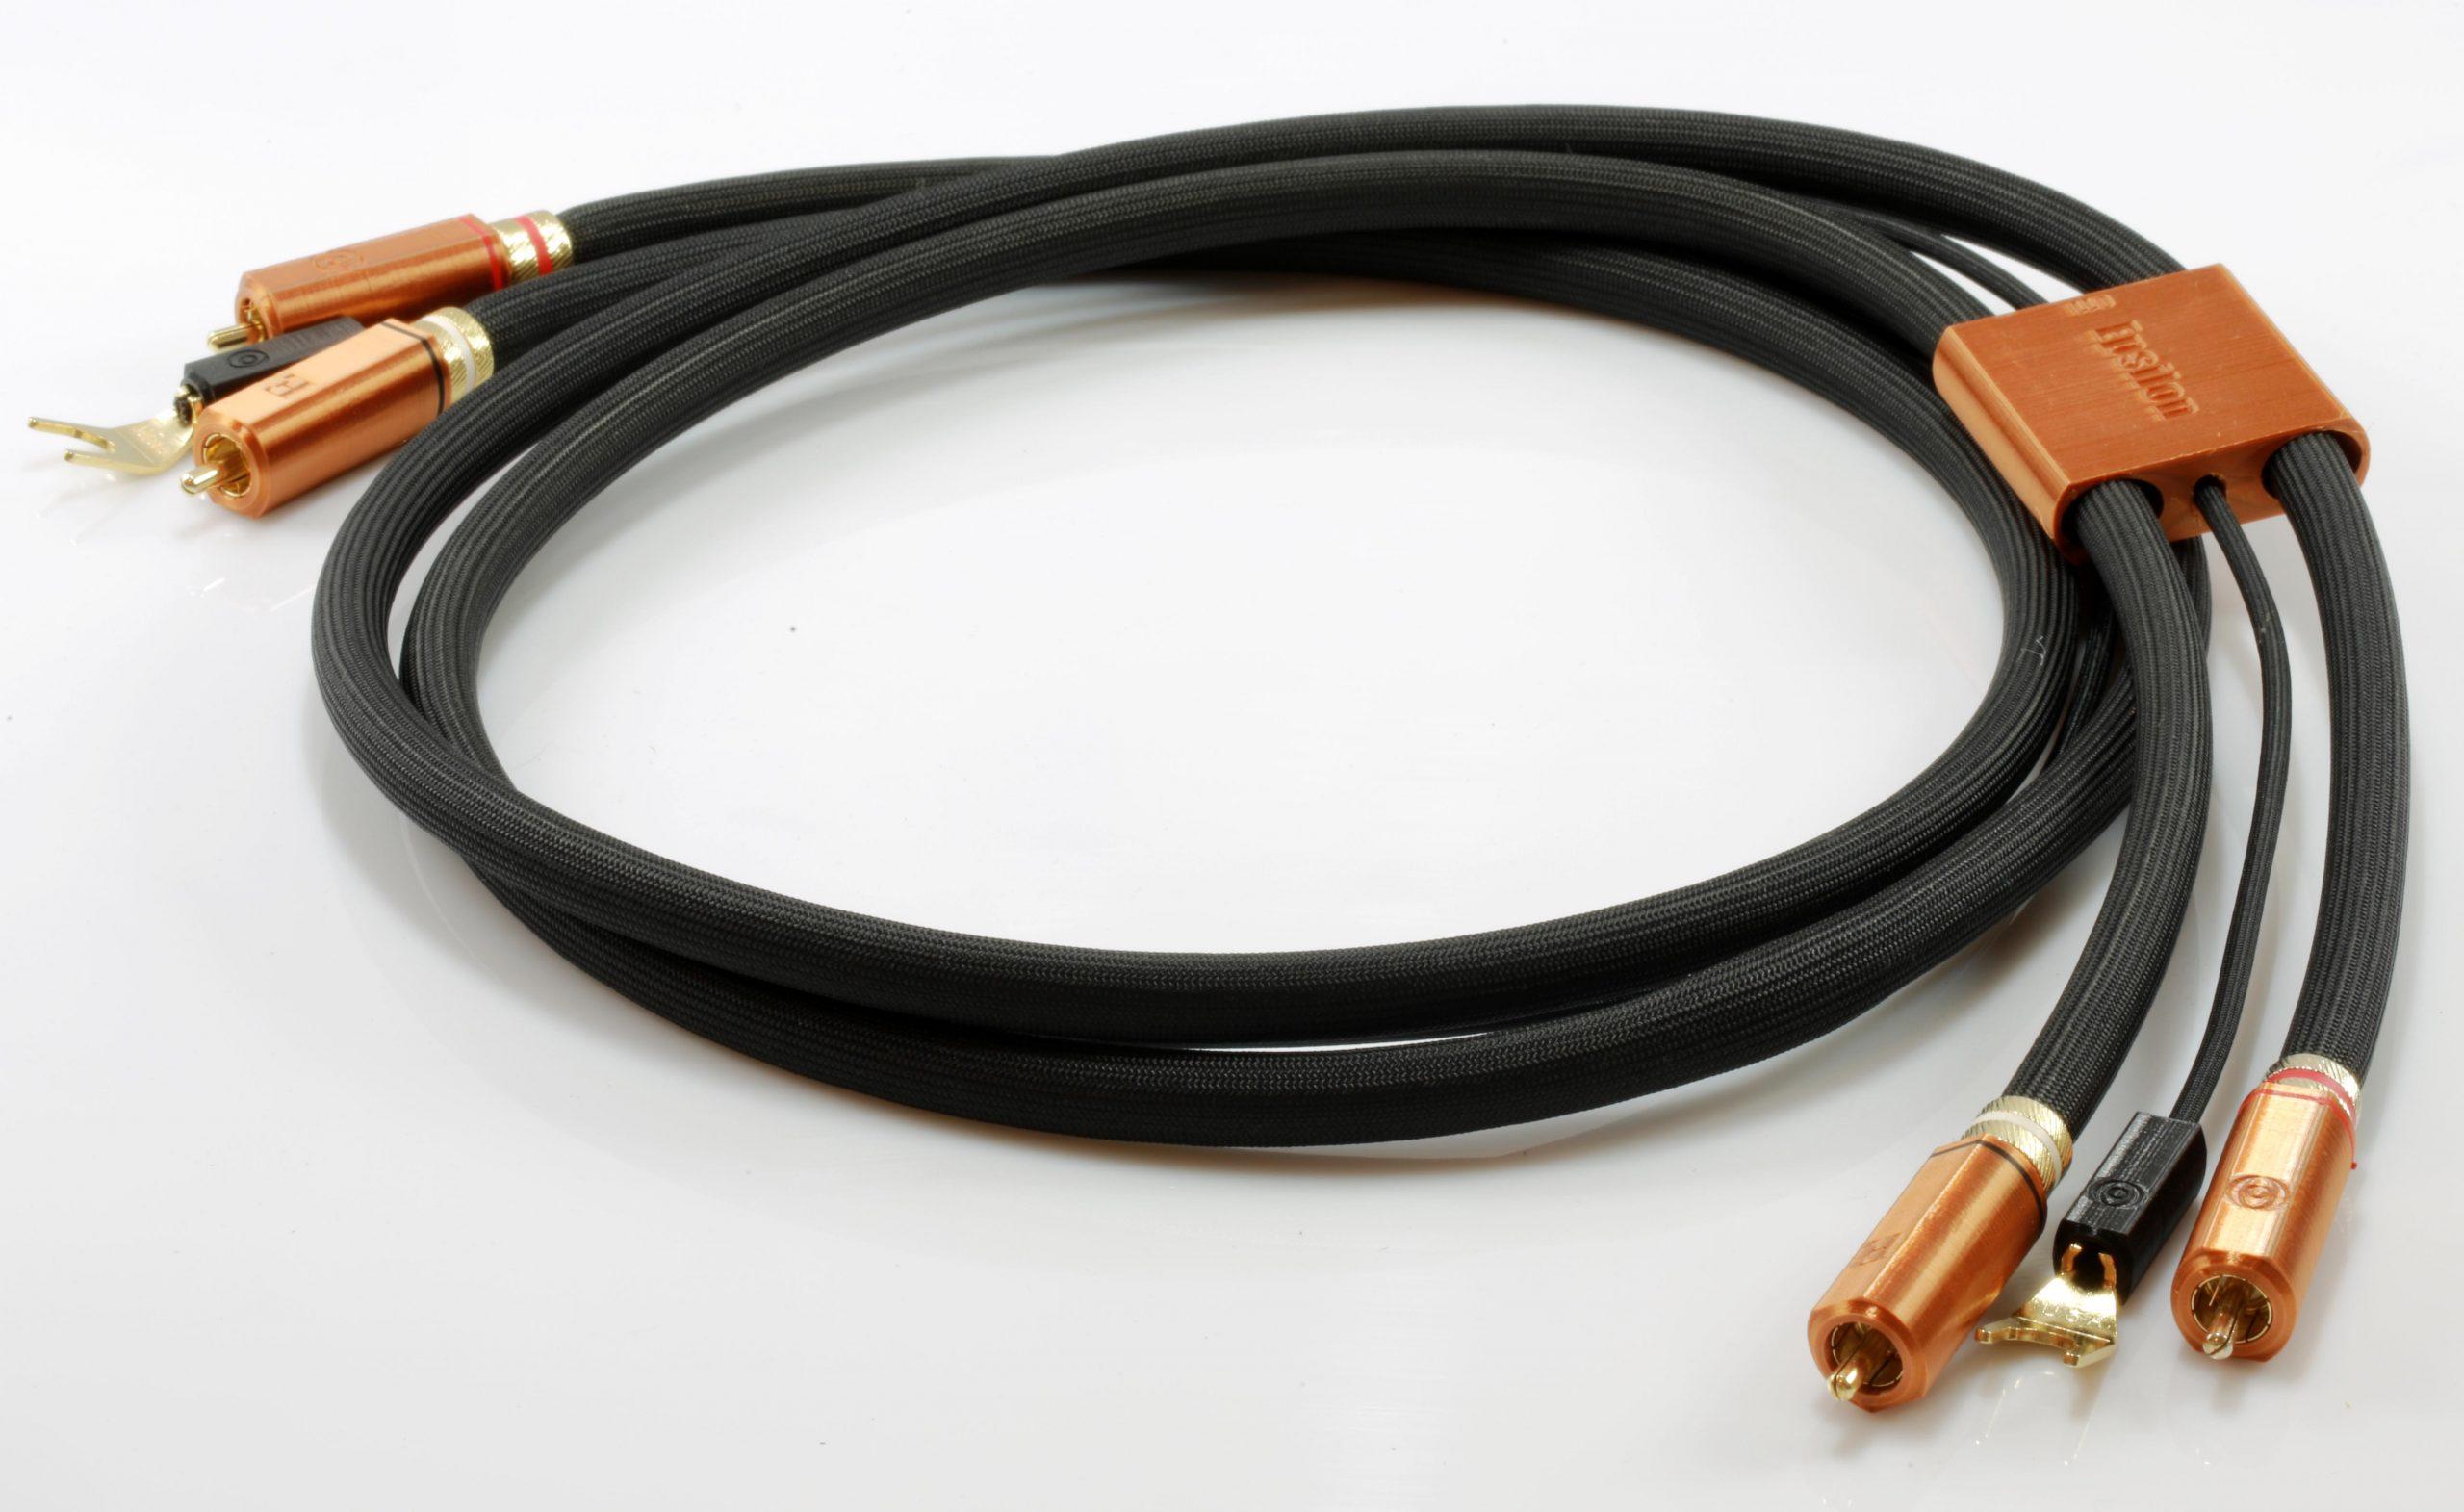 Epsilon Phono RCA odeion cables